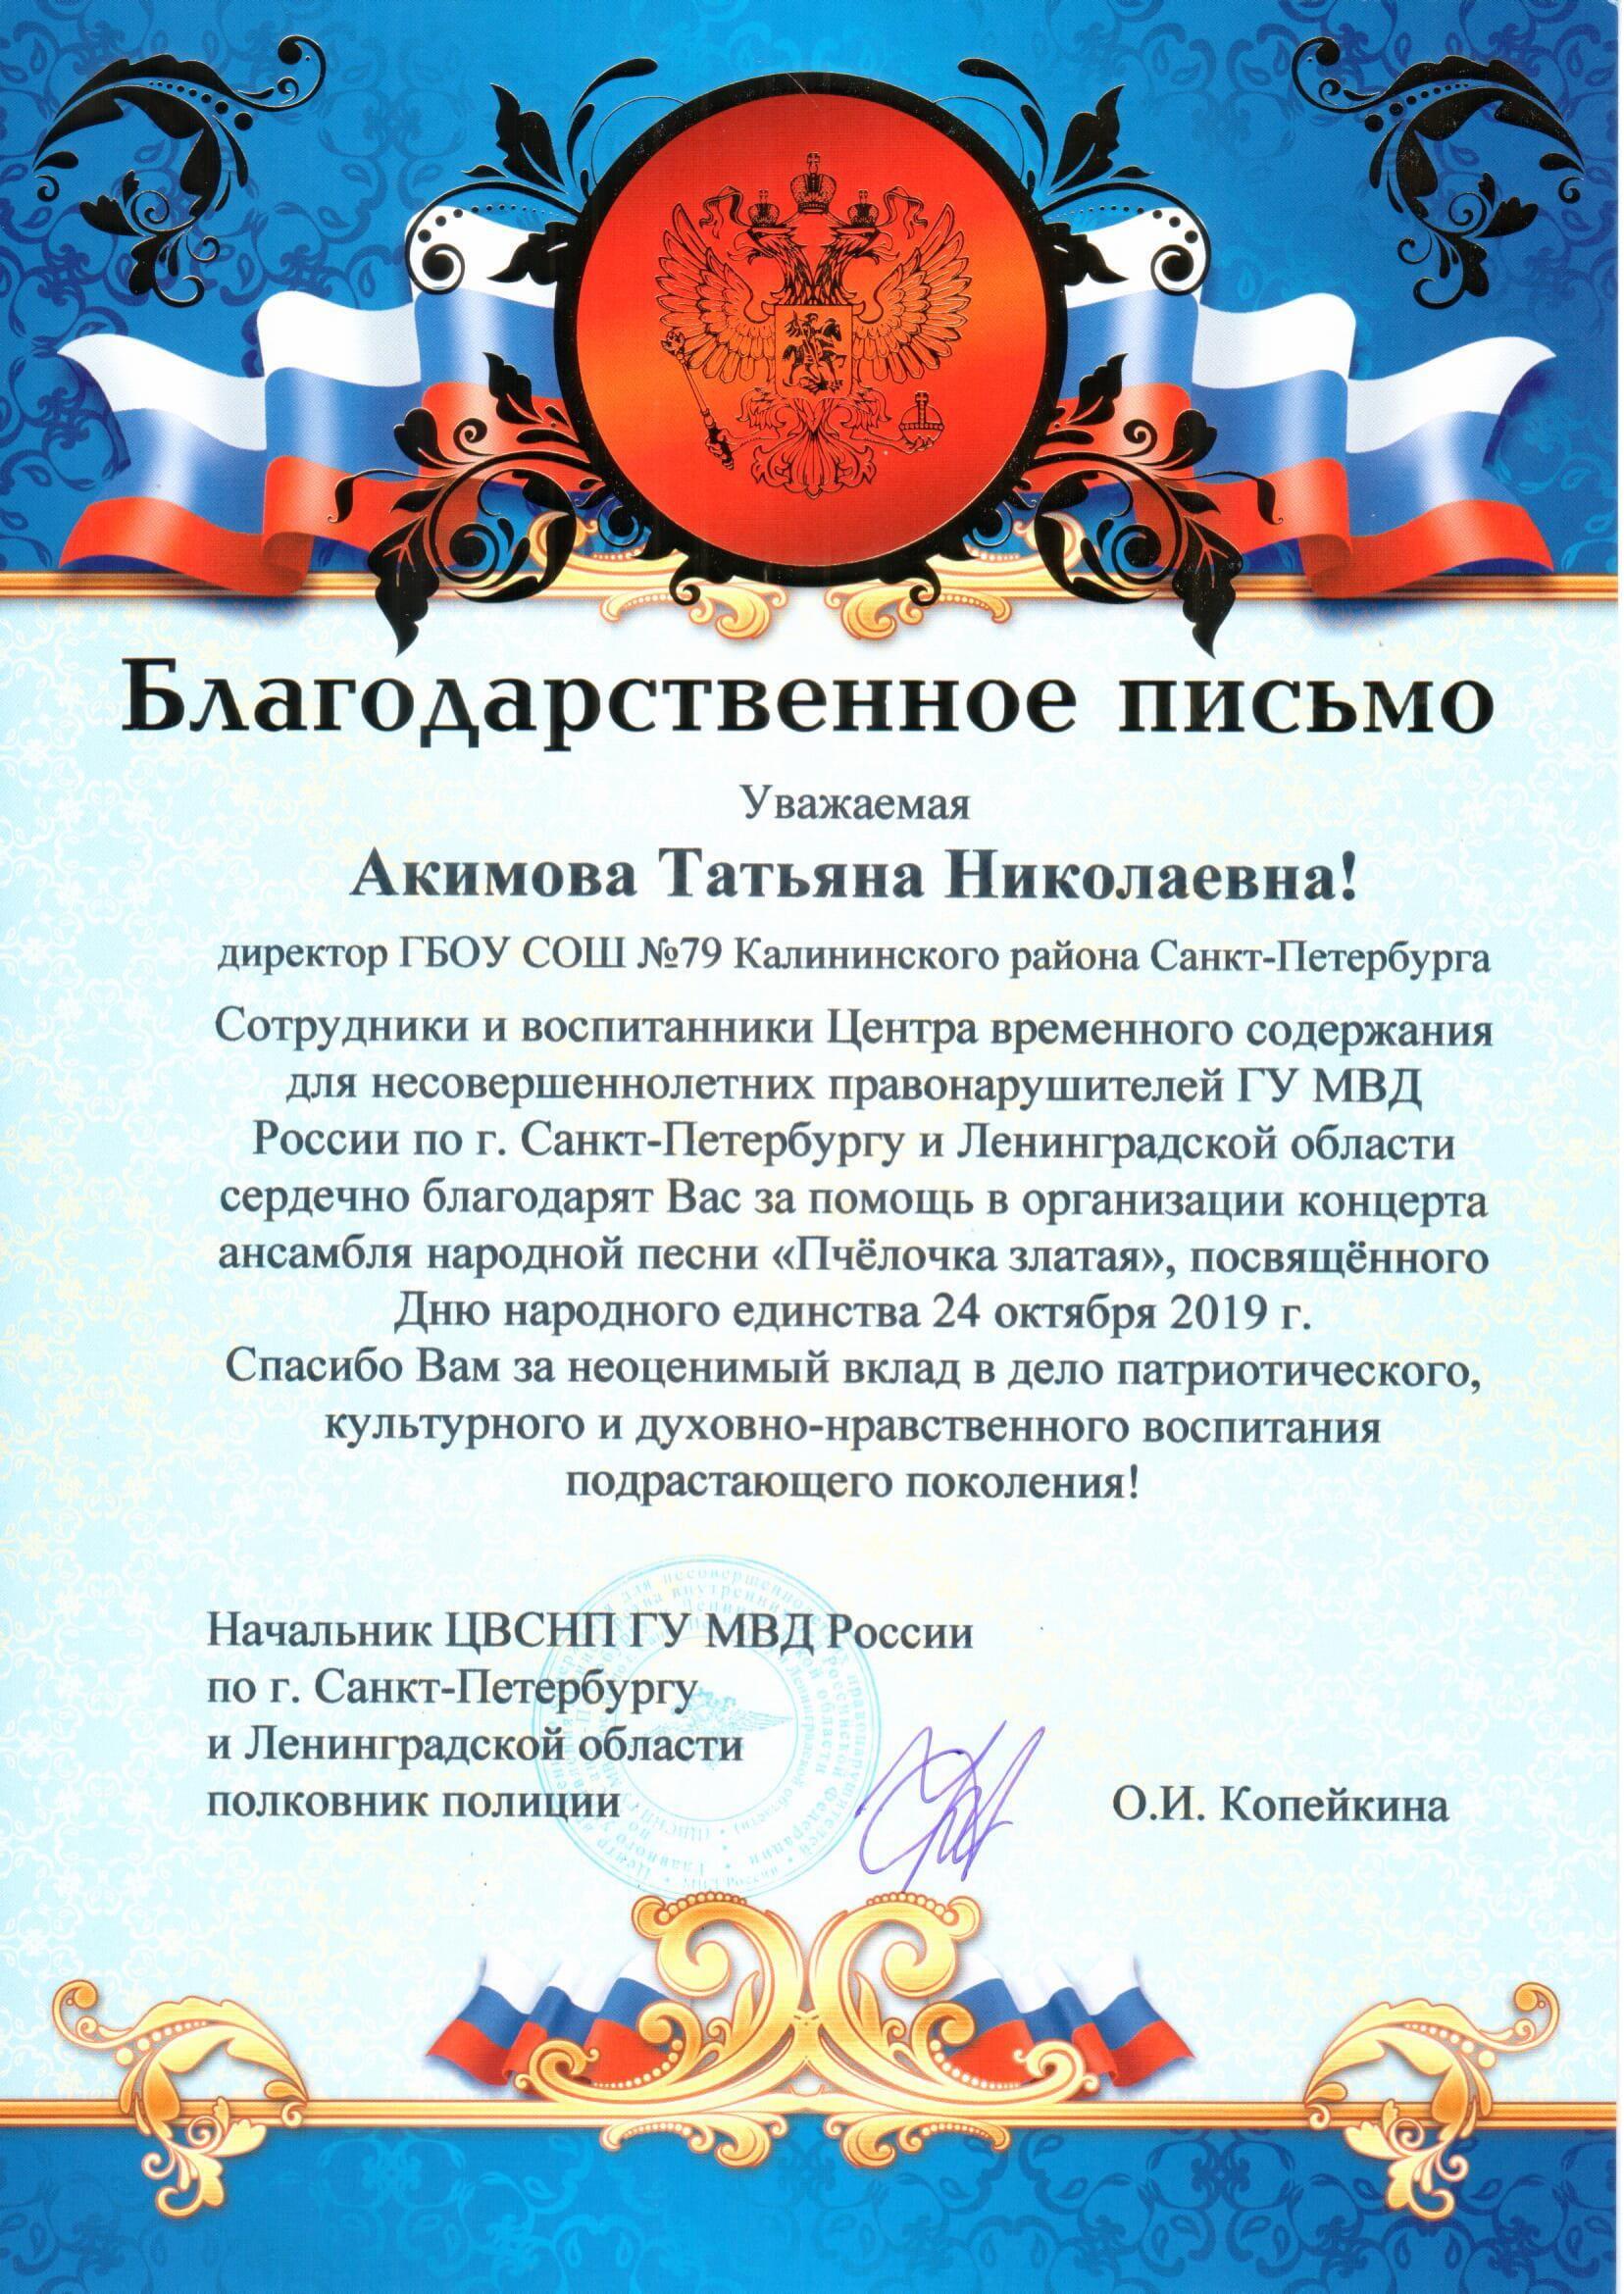 Благодарность коллективу АПН Пчелочка Златая ГУМВД 24.10.19-1